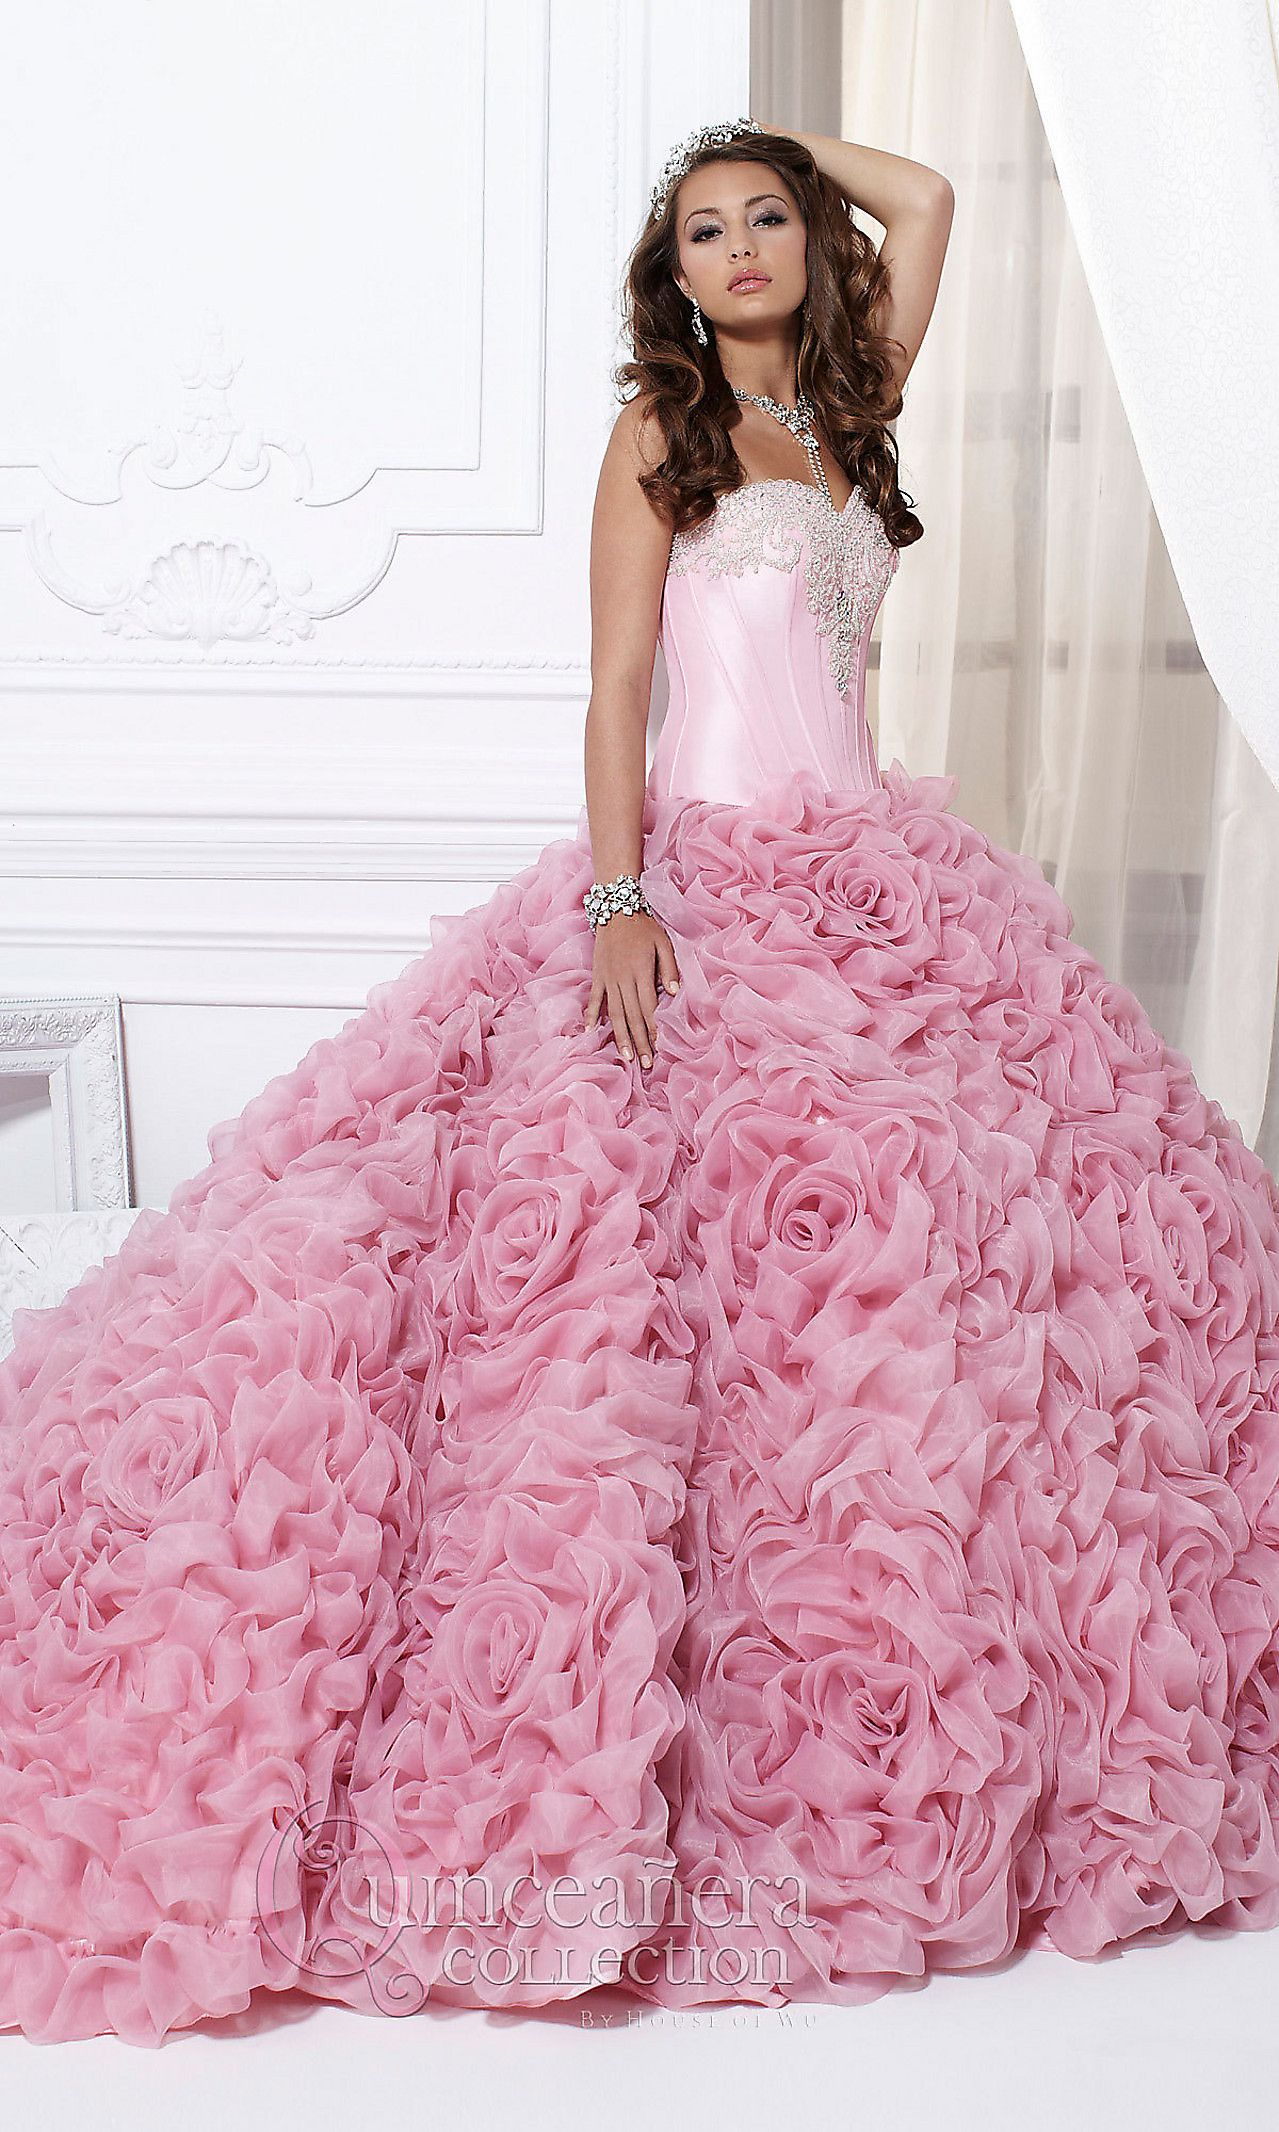 Pin de michéle borde en rose | Pinterest | Modelos de vestido ...